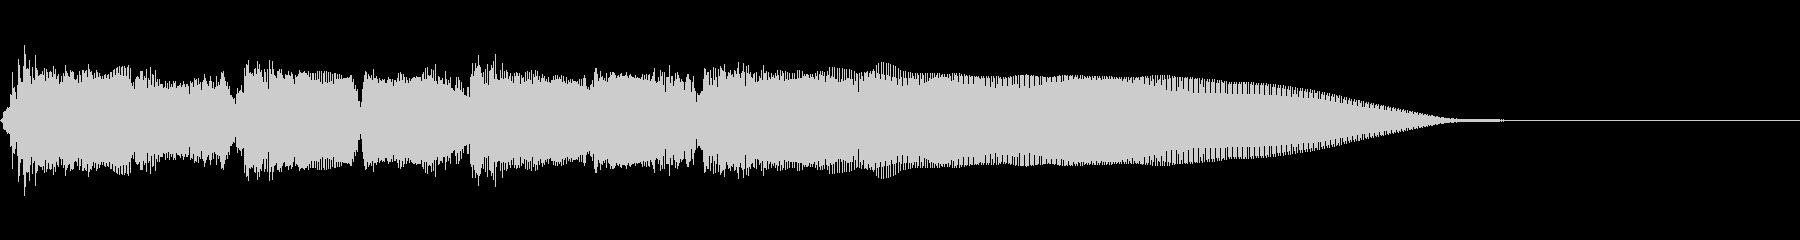 Guitarジングル5/チャイナ!!の未再生の波形